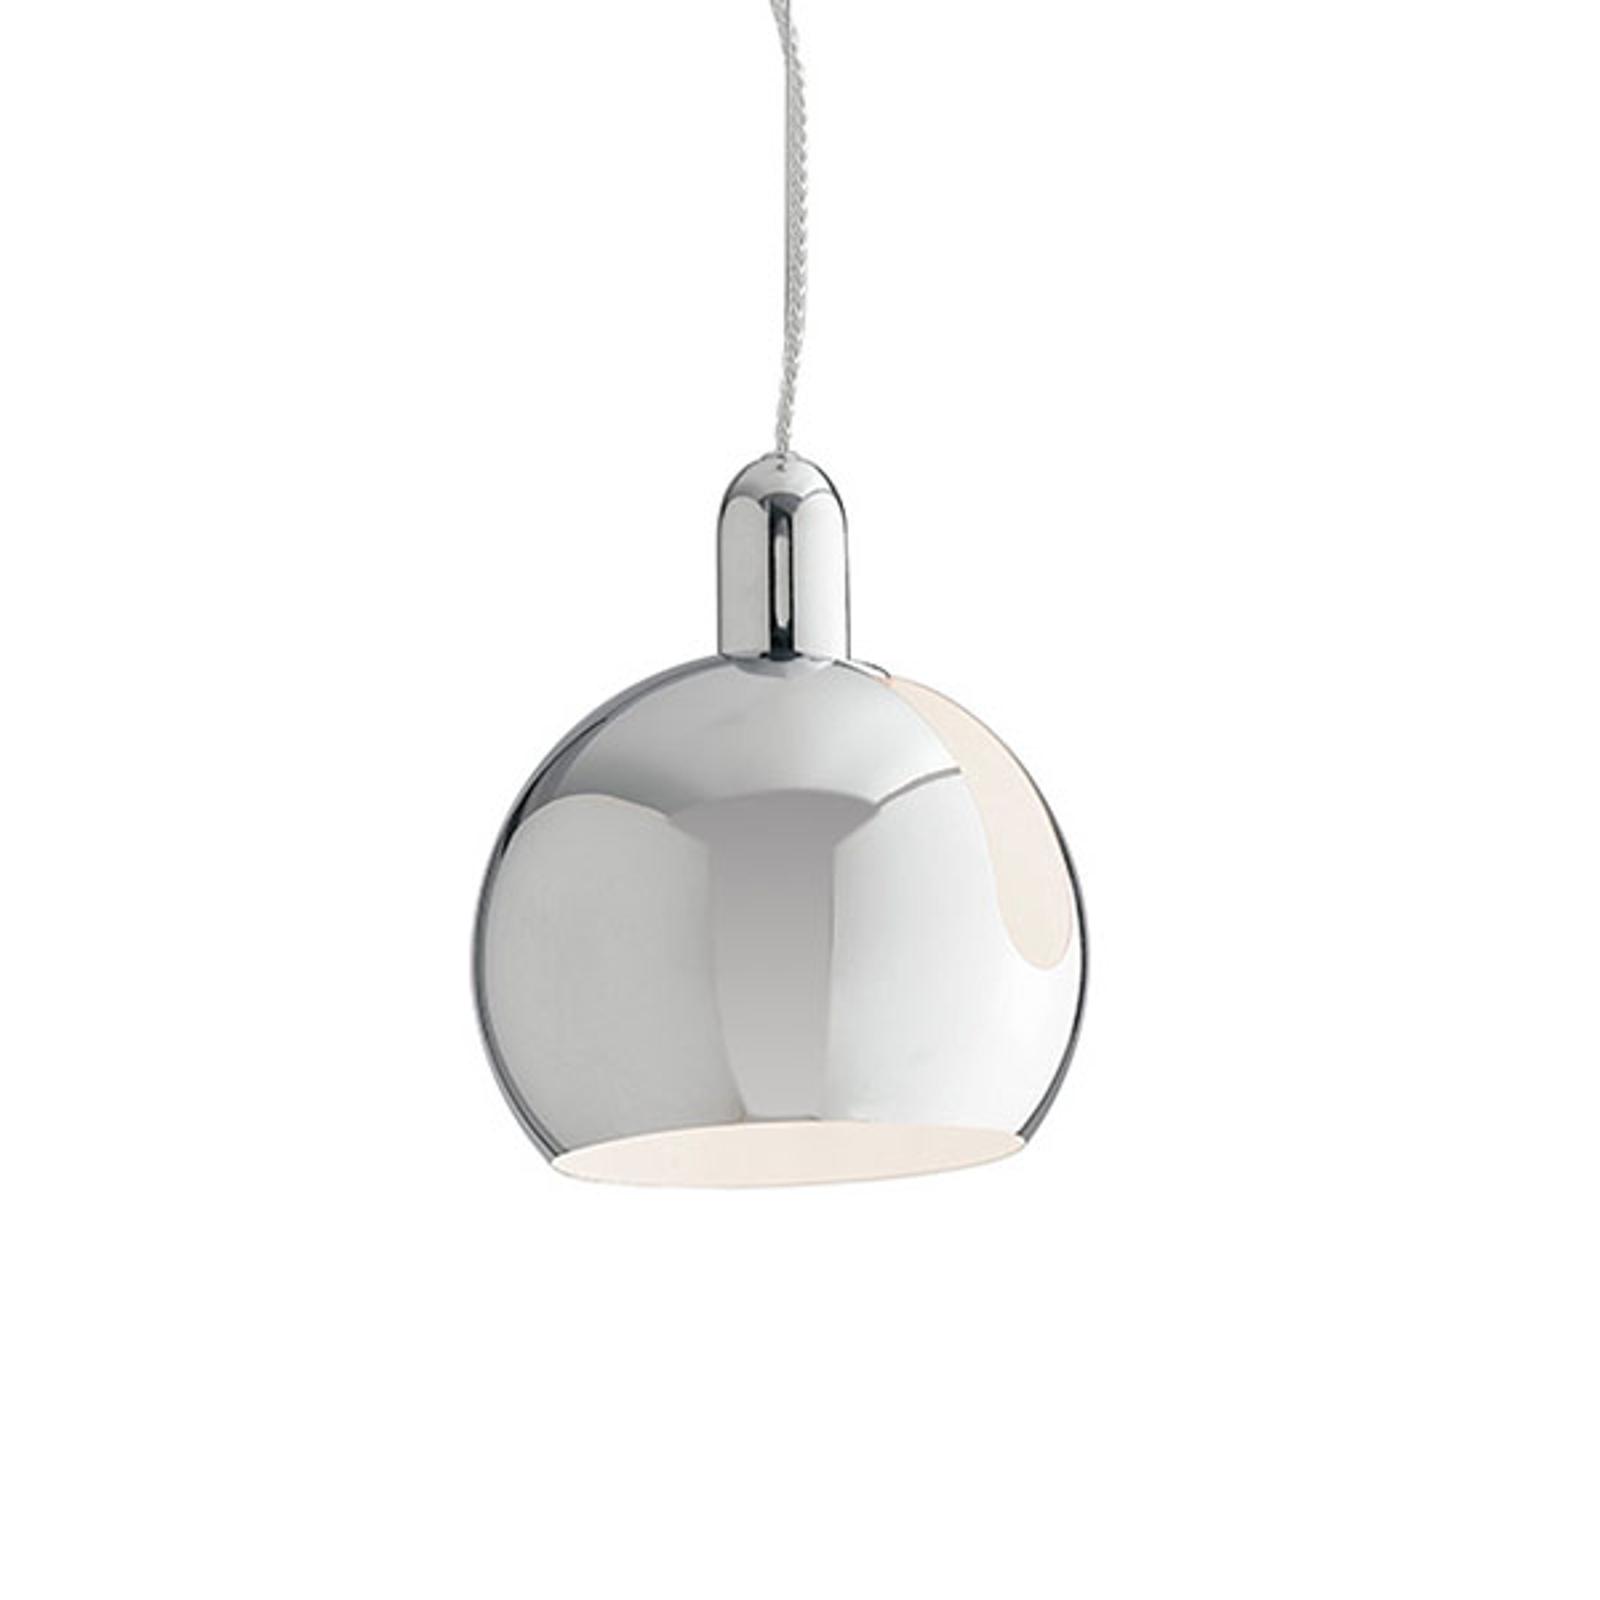 Lampa wisząca Narciso Ø 20cm